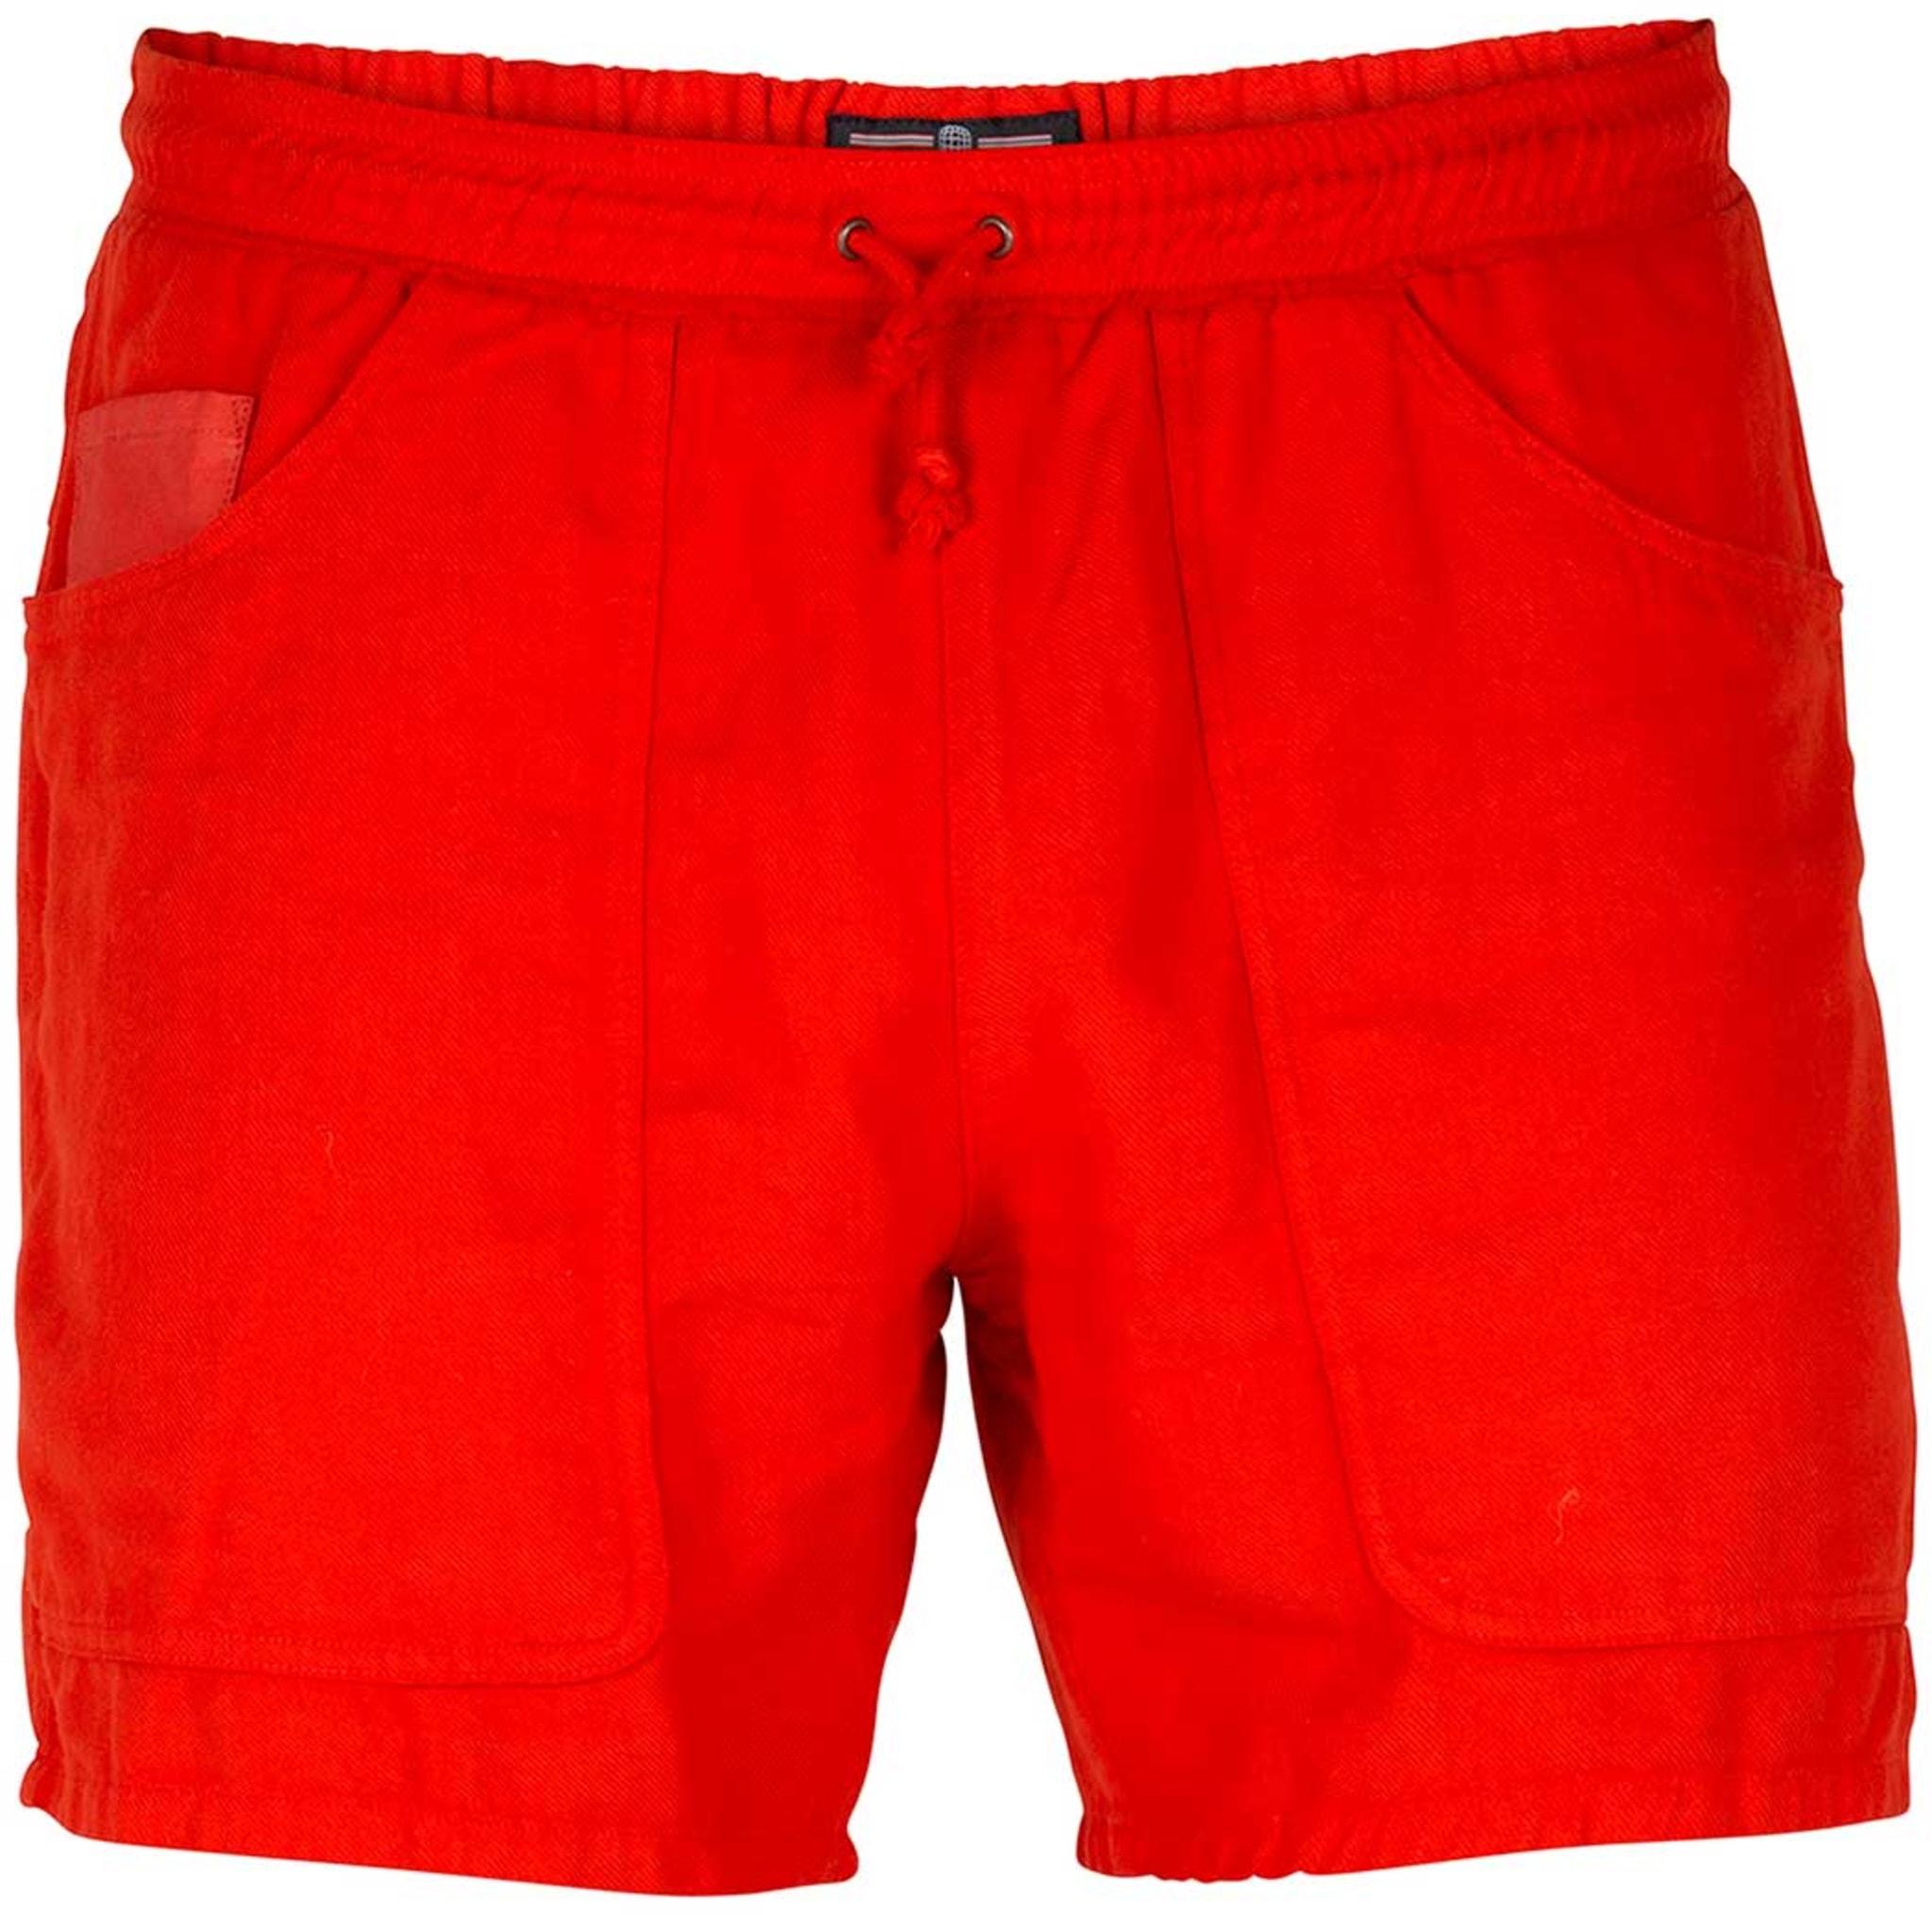 6incher Vagabond Shorts Garment Dyed Mens